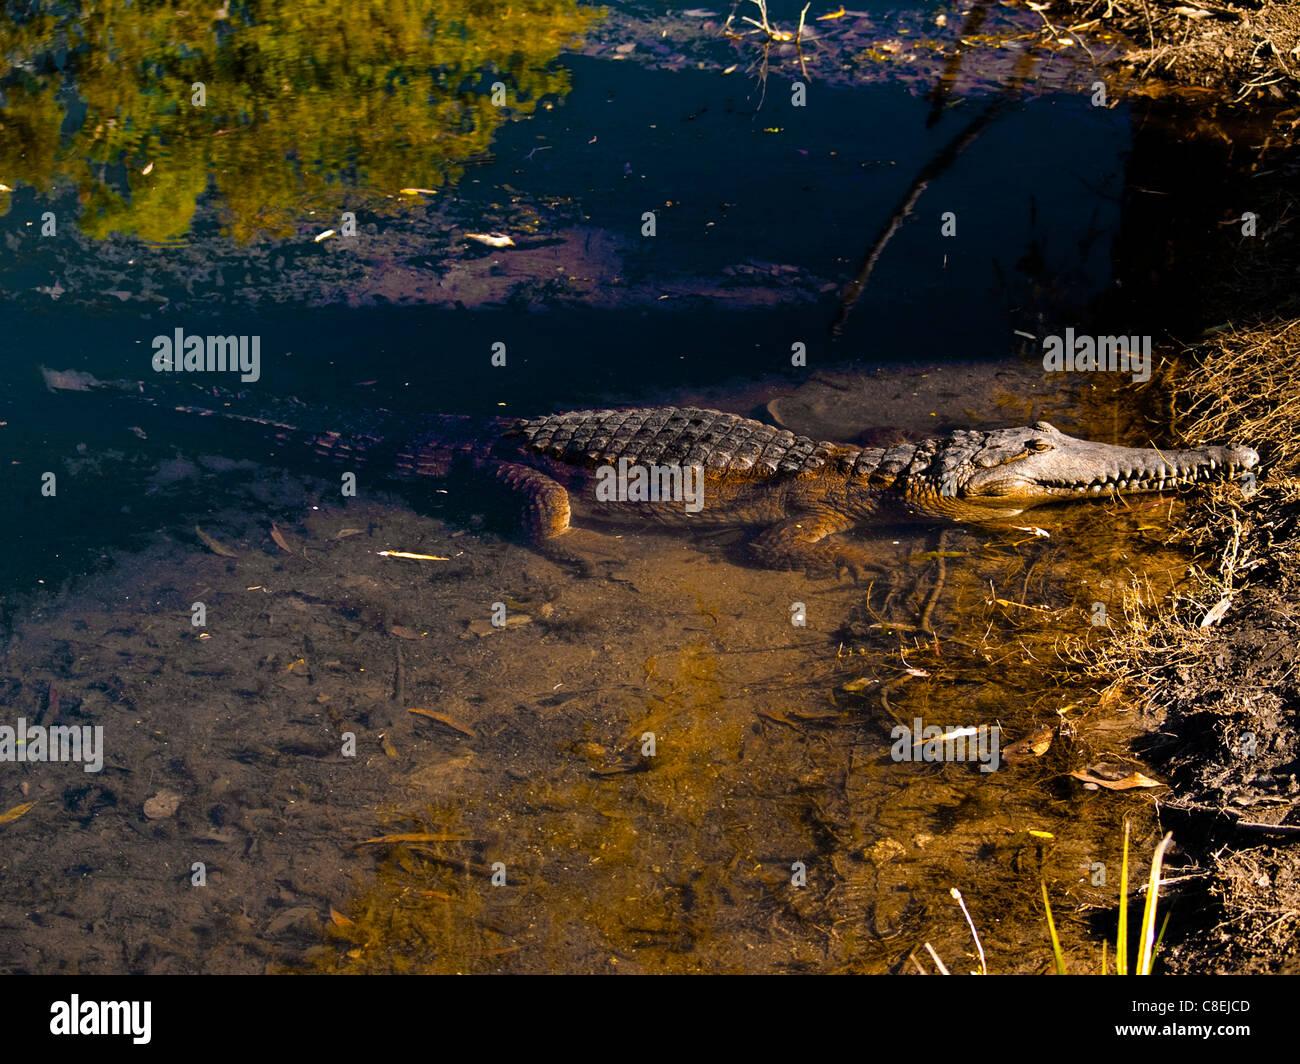 Australian Estuarine or Saltwater crocodile (Crocodylus porosus) Northern Territory, Australia - Stock Image